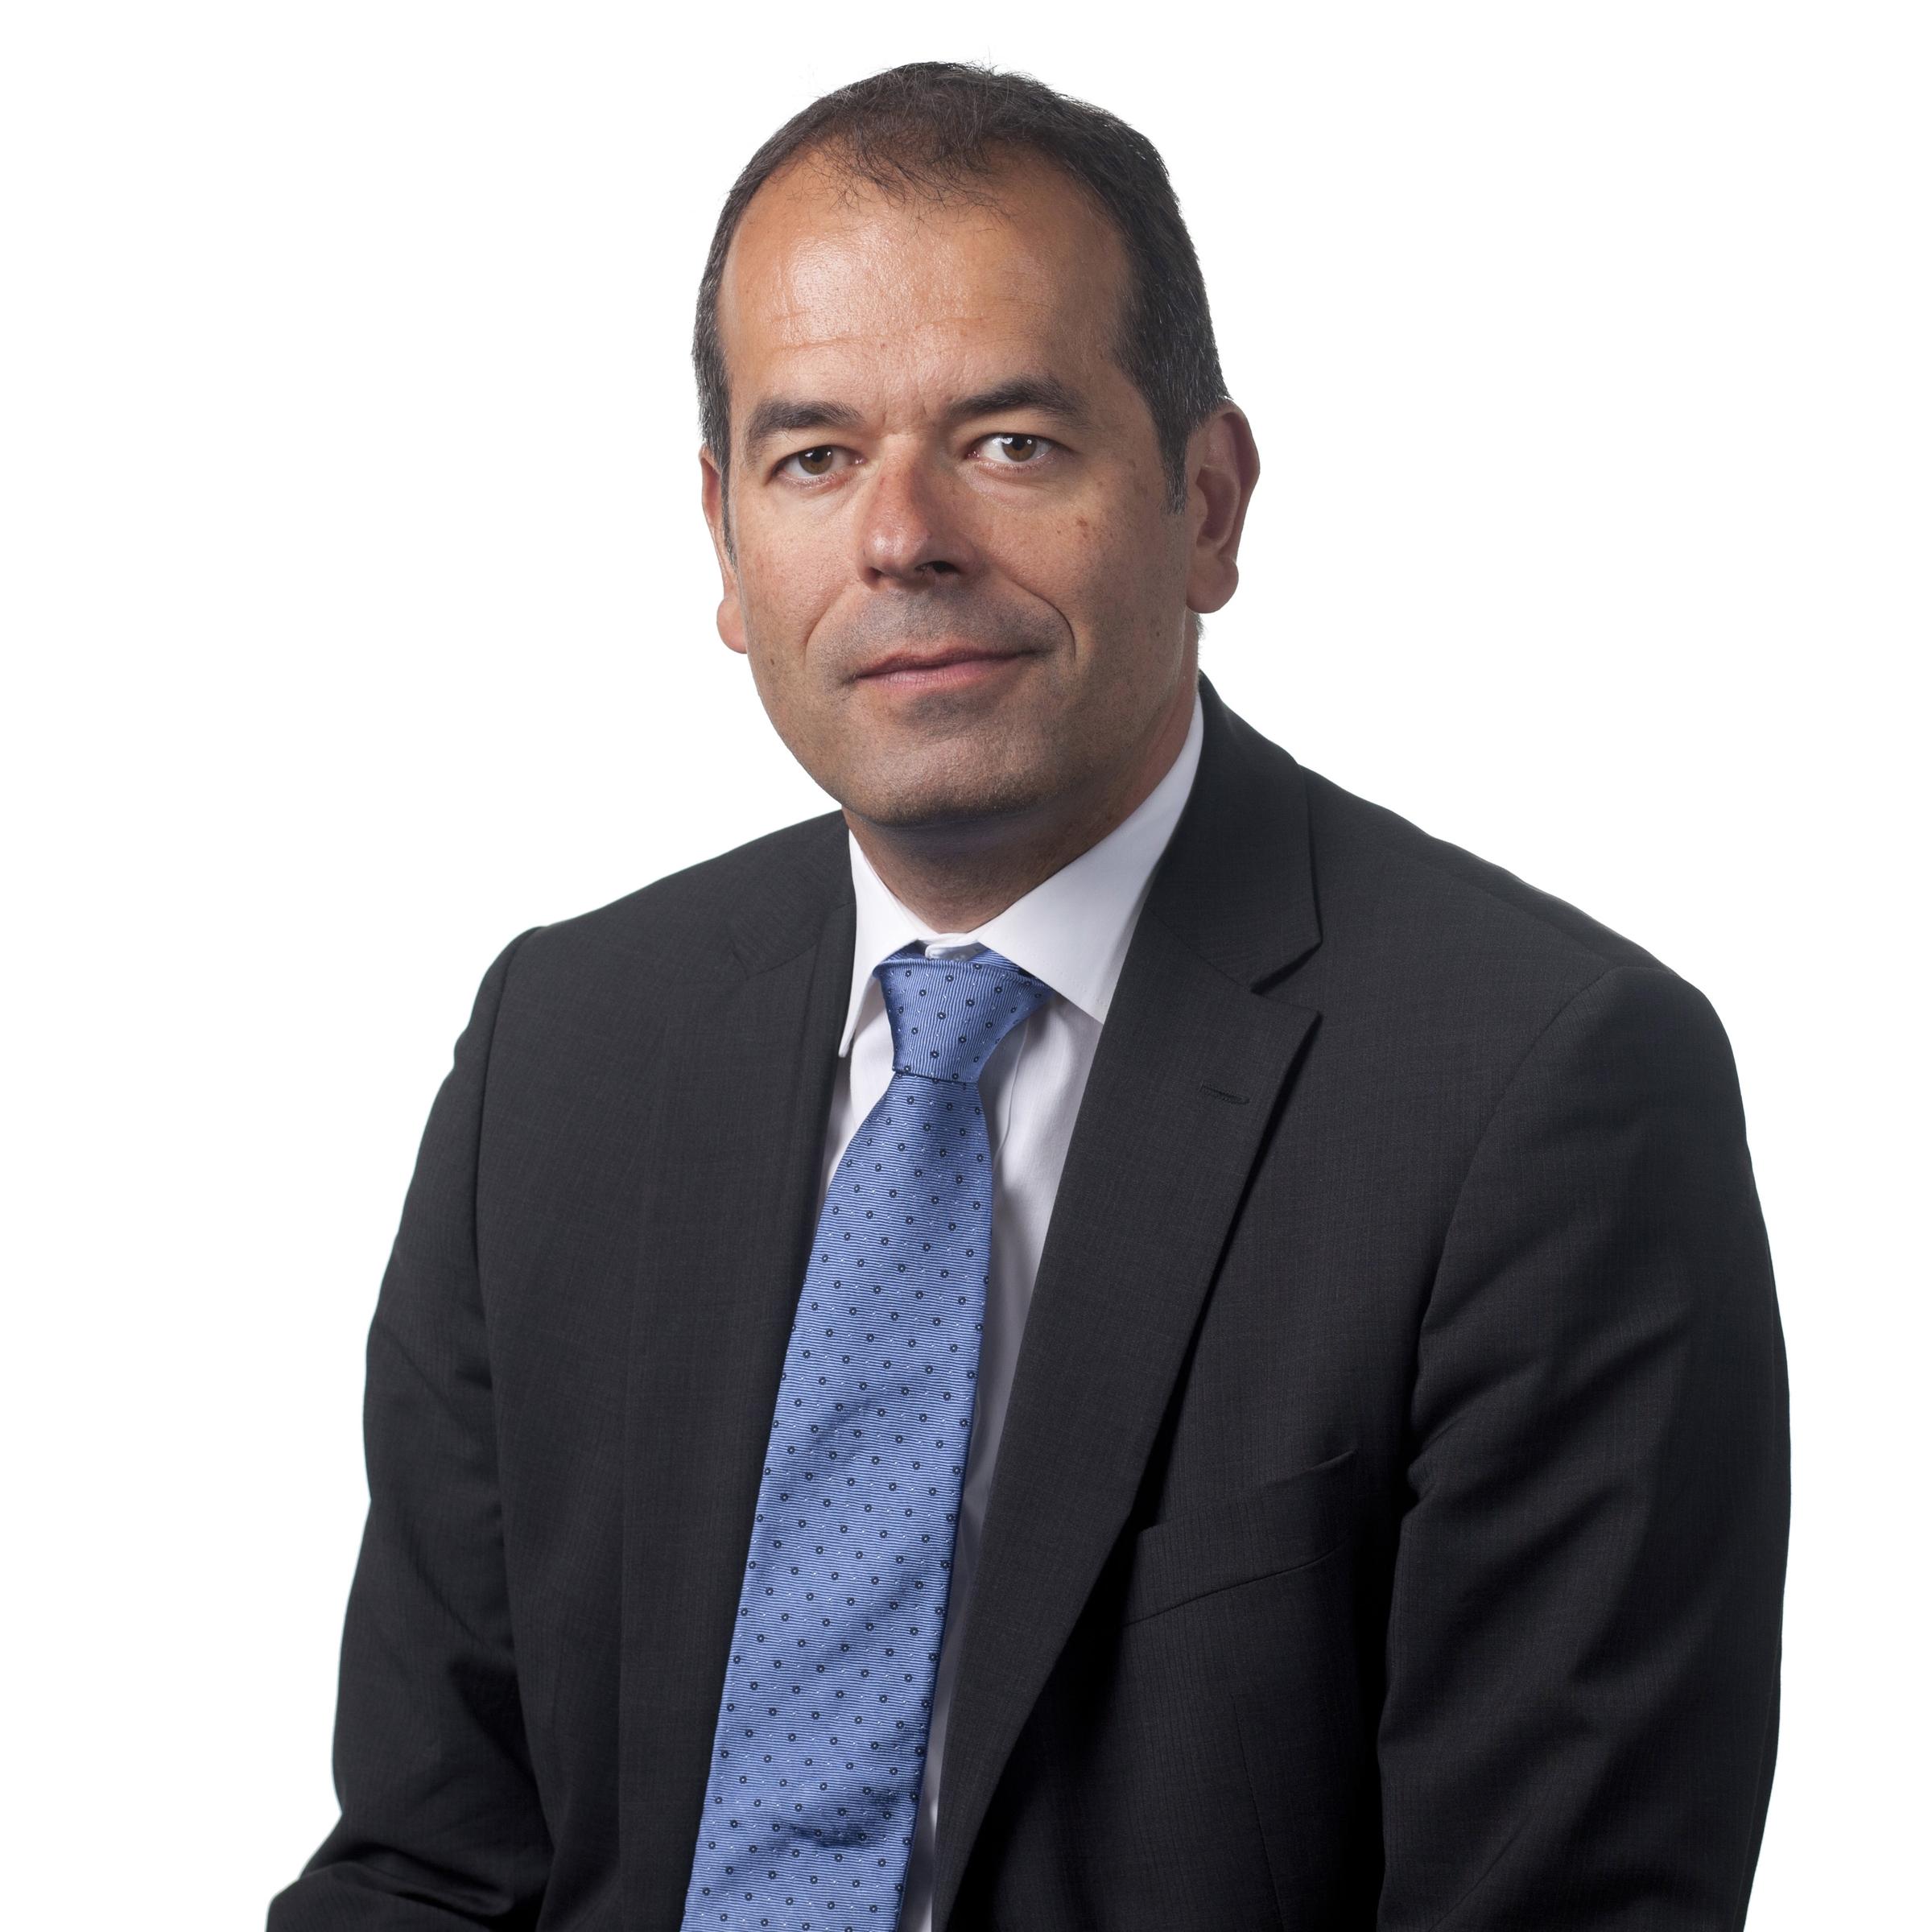 Erik Brenneis, Internet of Things director, Vodafone